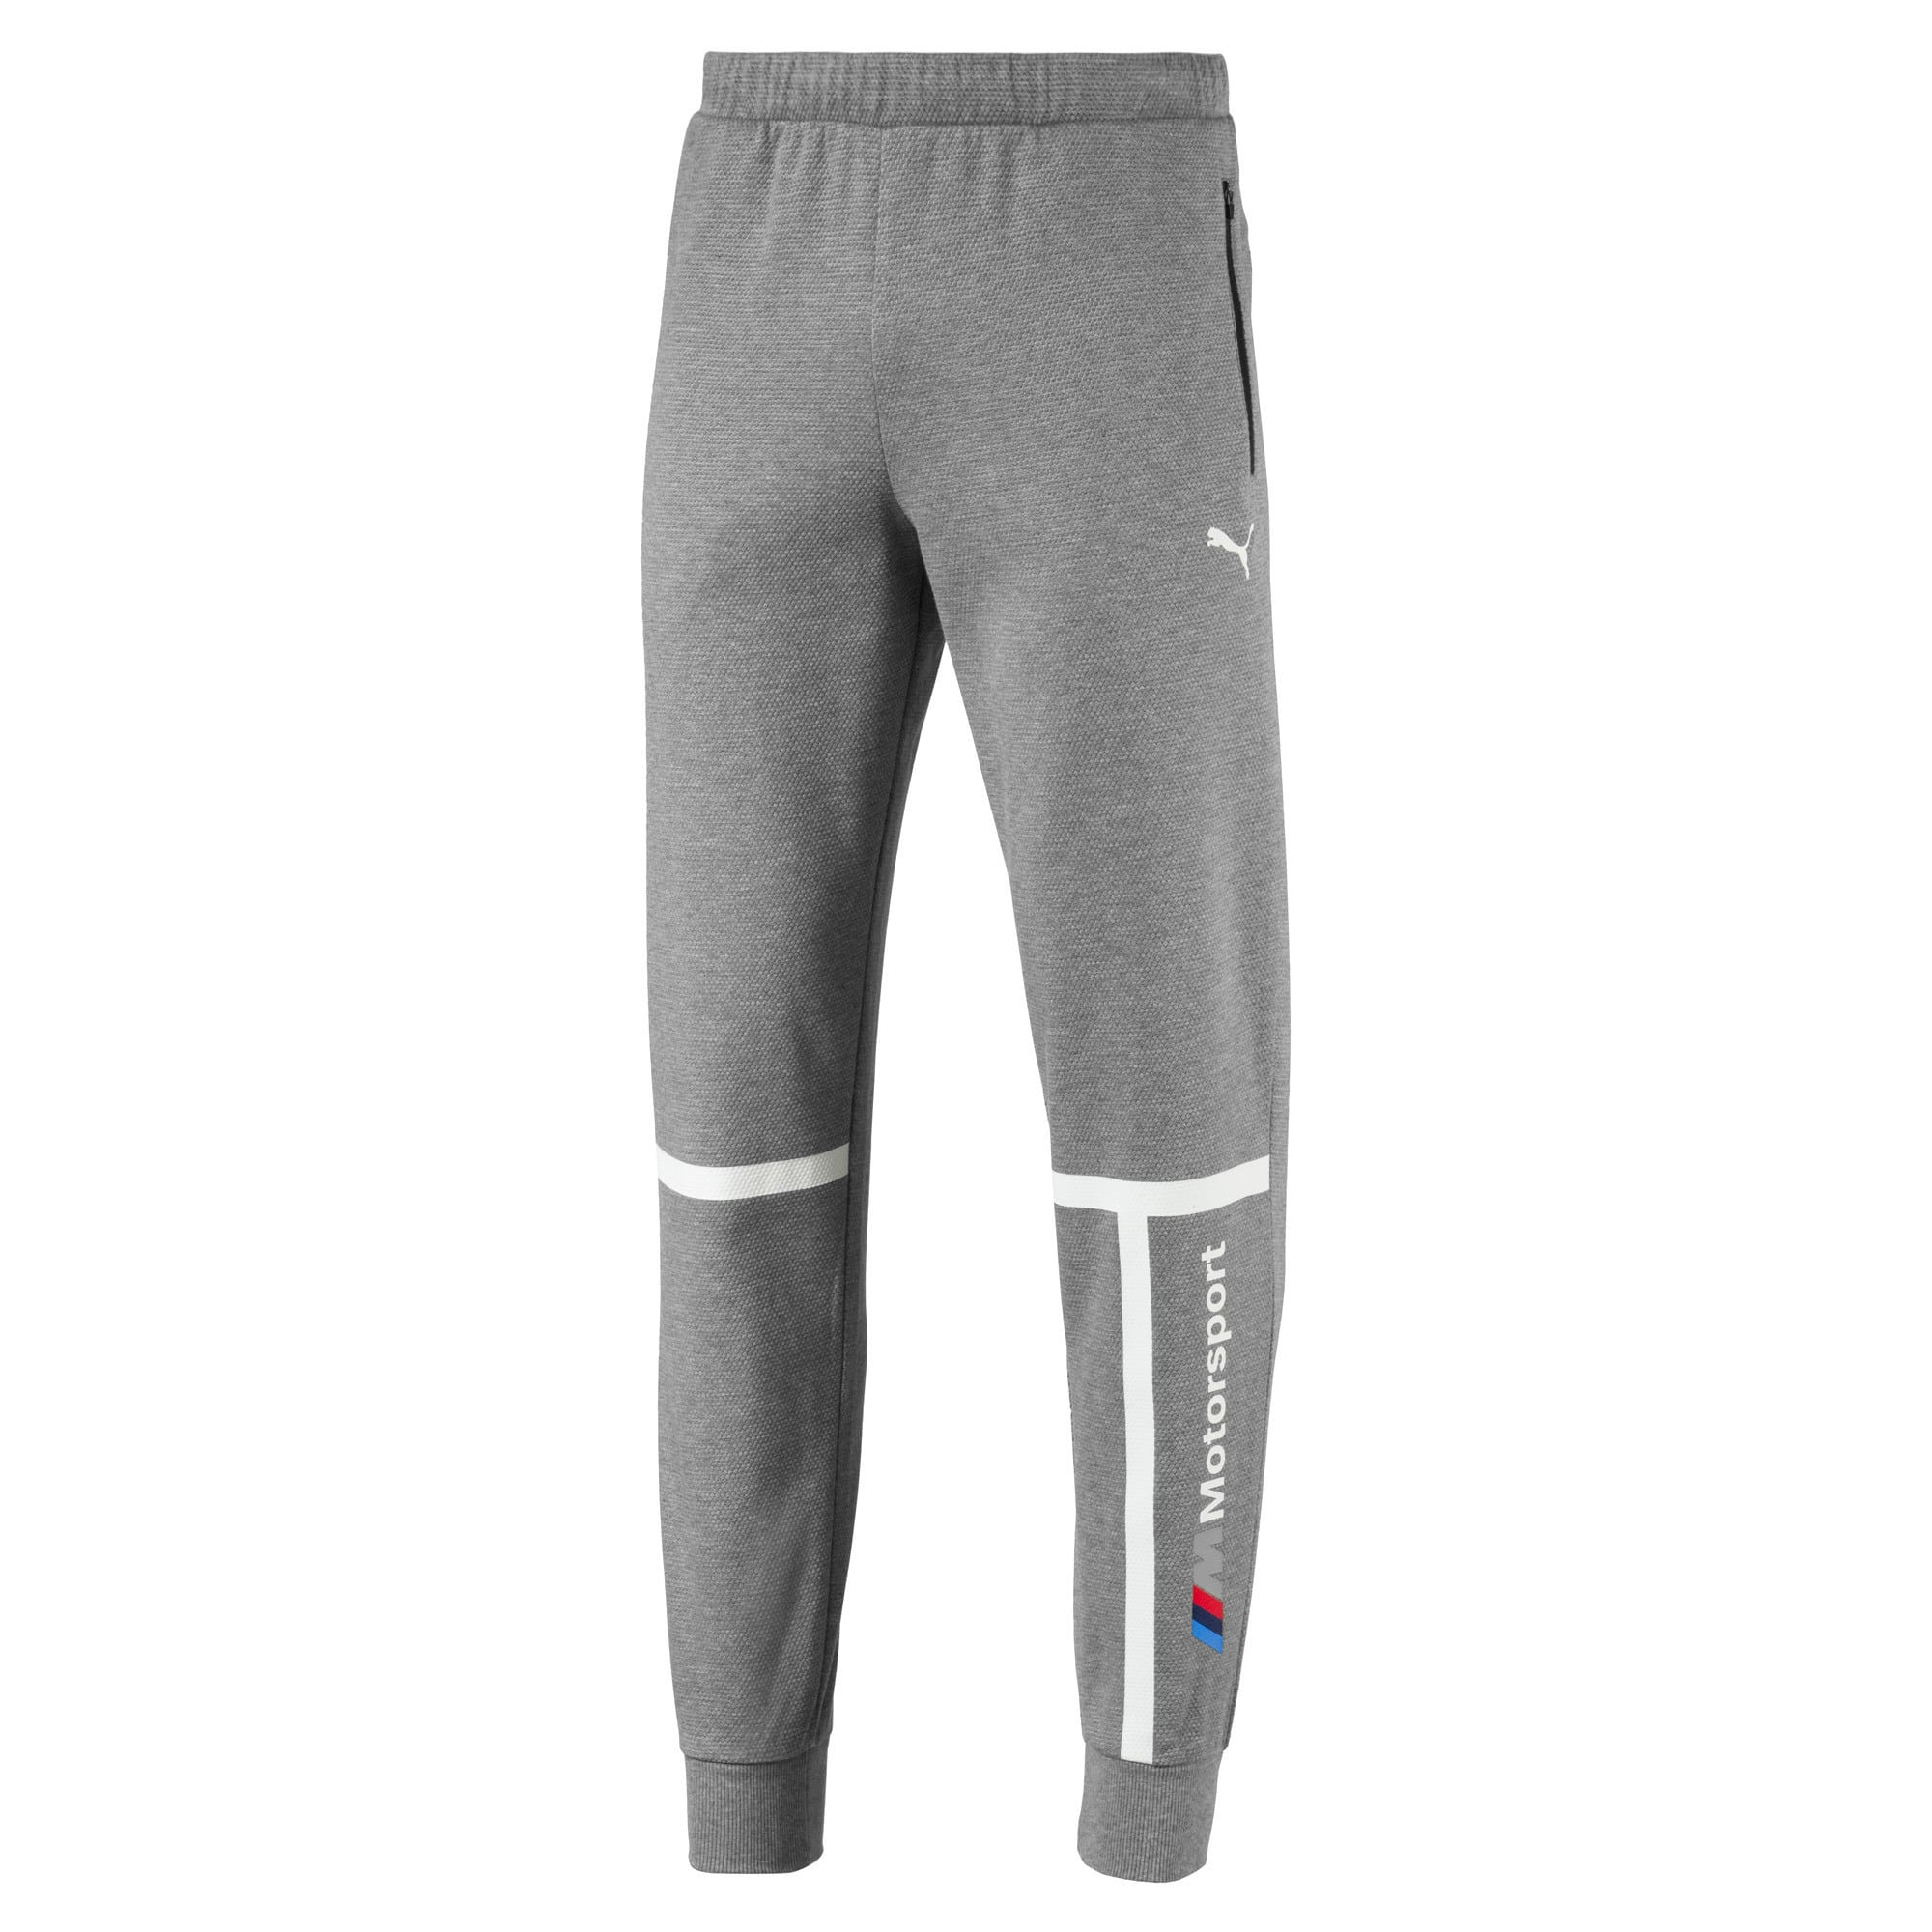 Miniatura 4 de Pantalones deportivos BMW M Motorsport para hombre, Medium Gray Heather, mediano